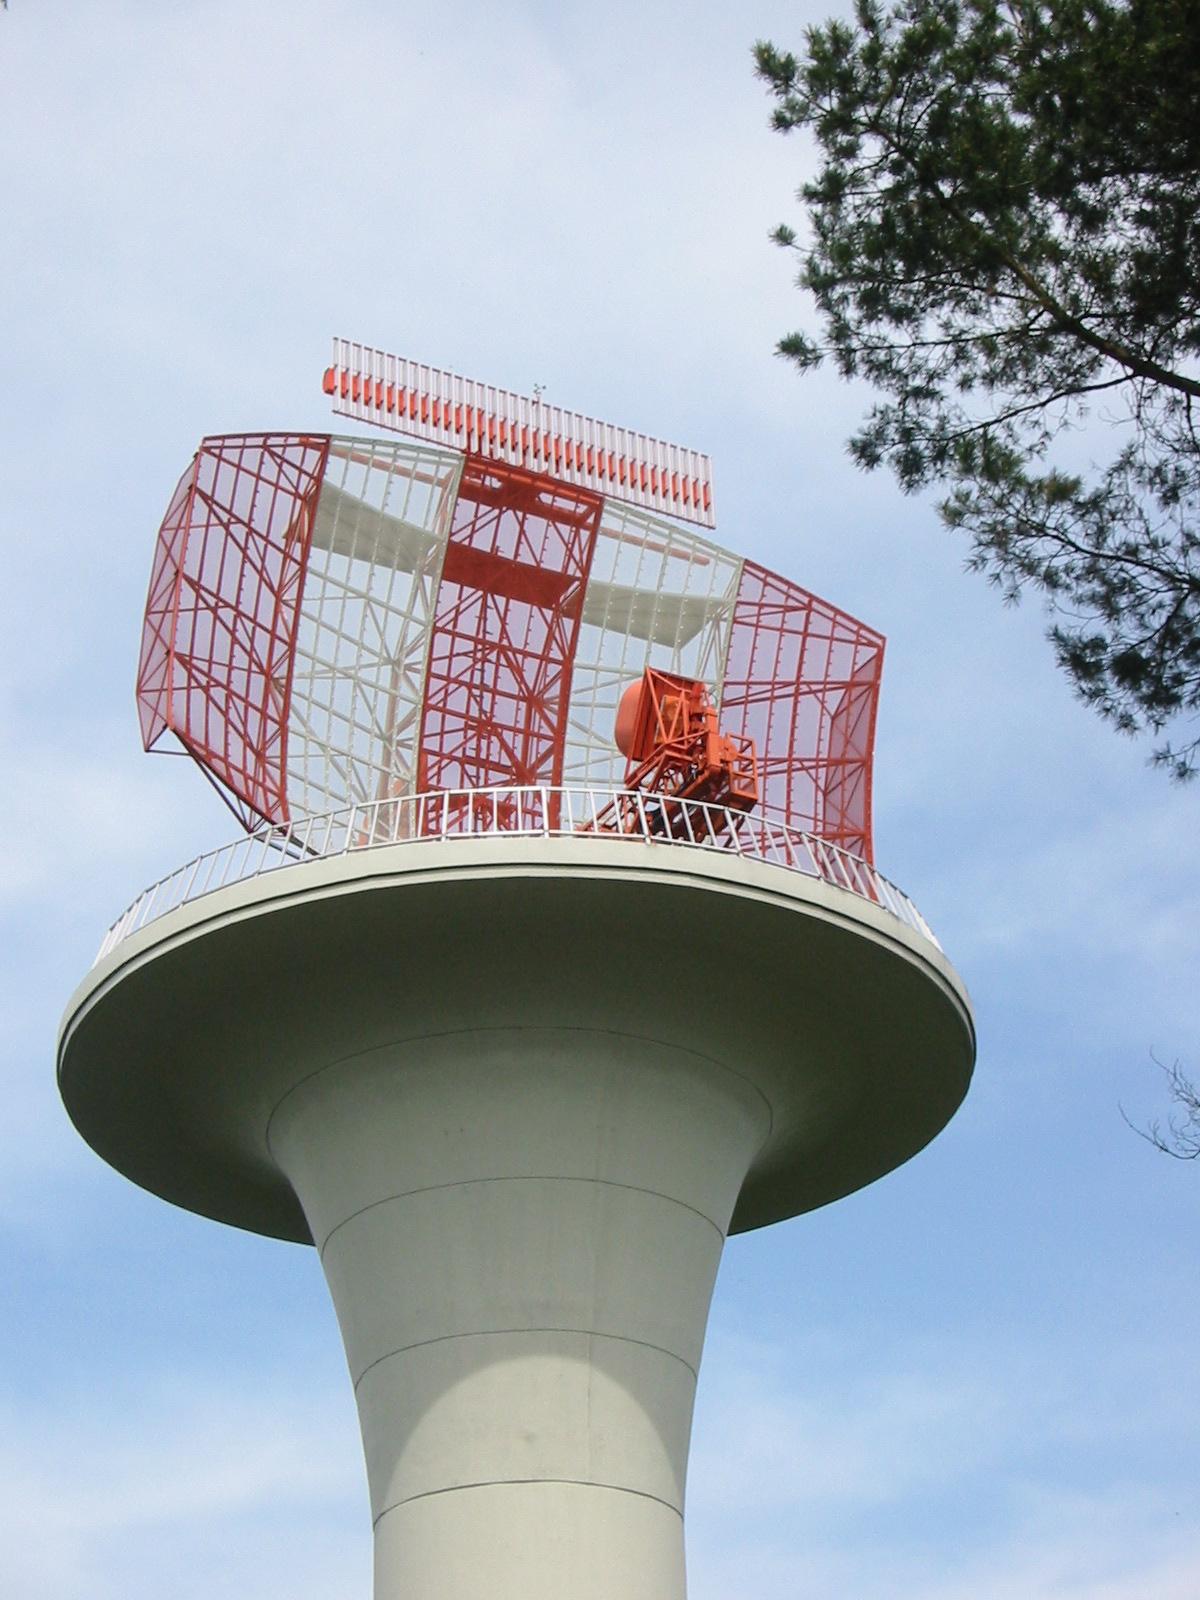 Deister-radar.jpg